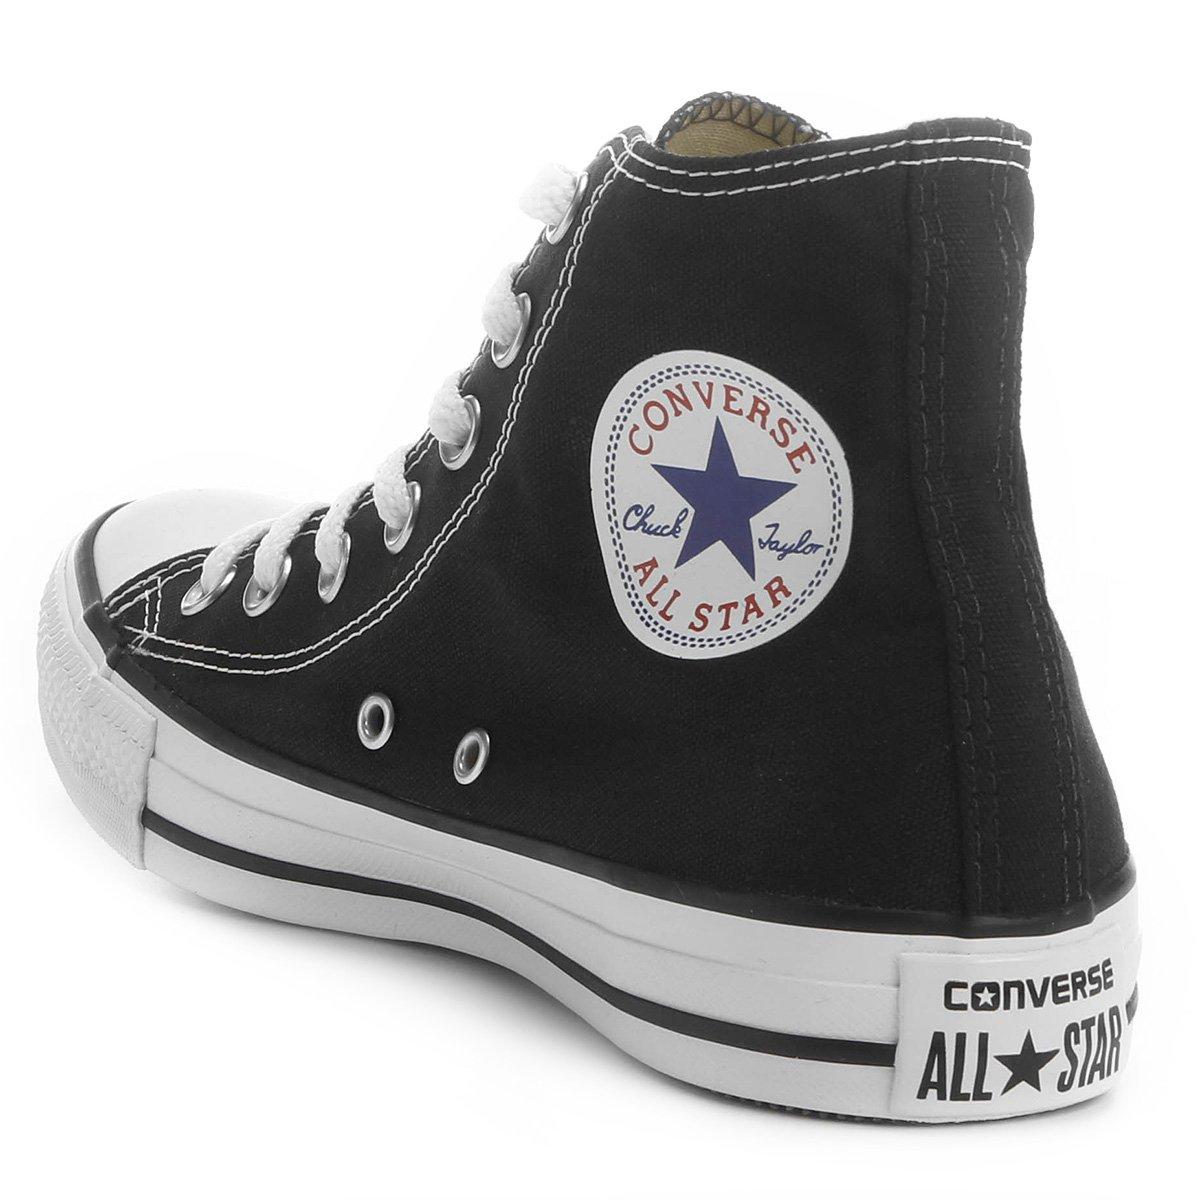 Tênis Cano Alto Converse All Star CT AS HI - Preto e Gelo - Compre ... f2aabbaf7aedc